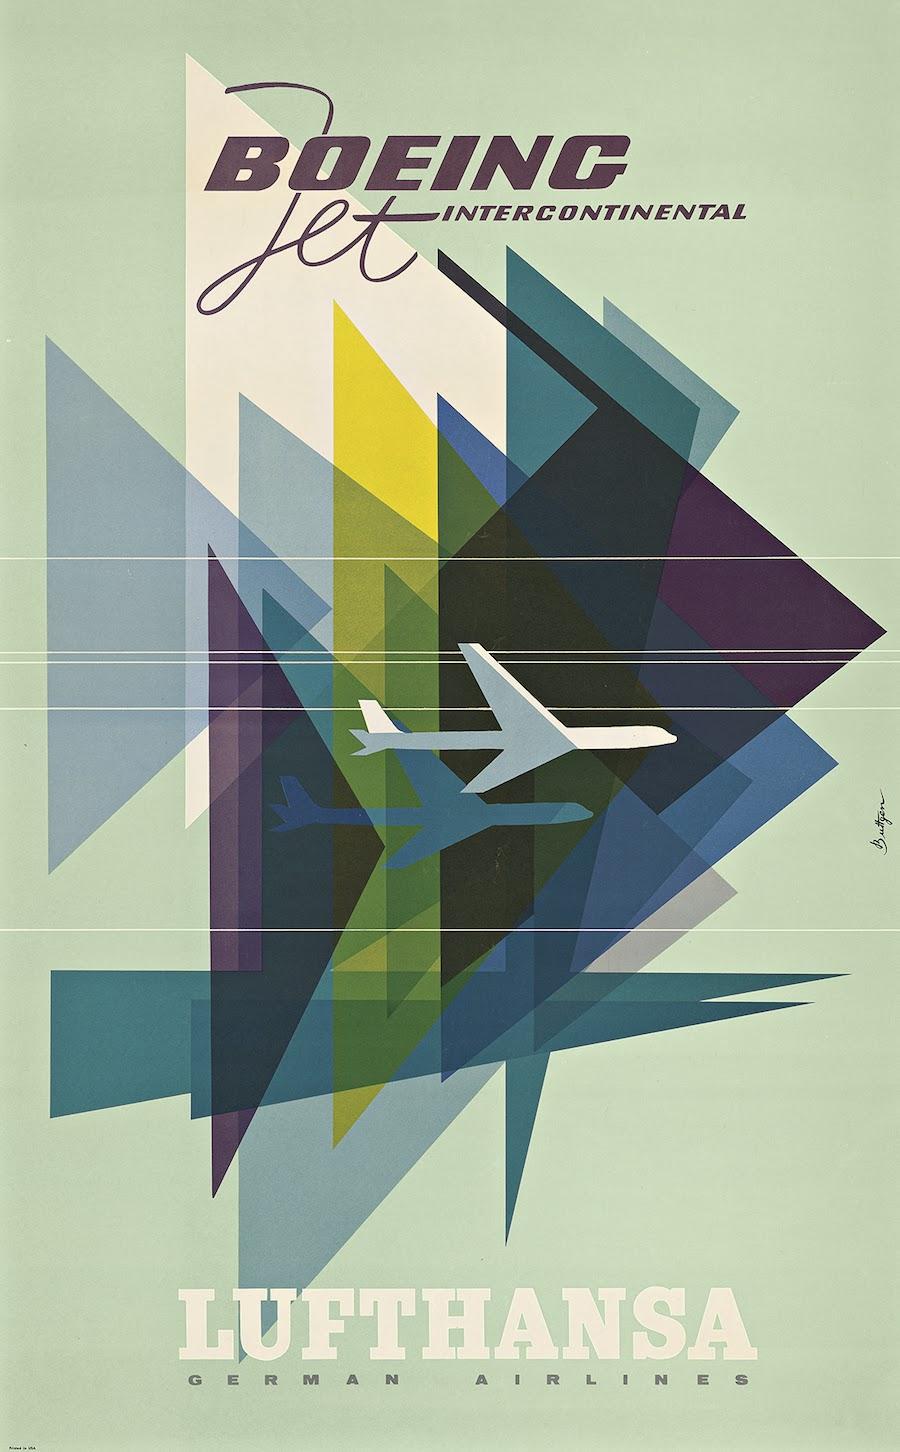 Lufthansa airline advertising branding